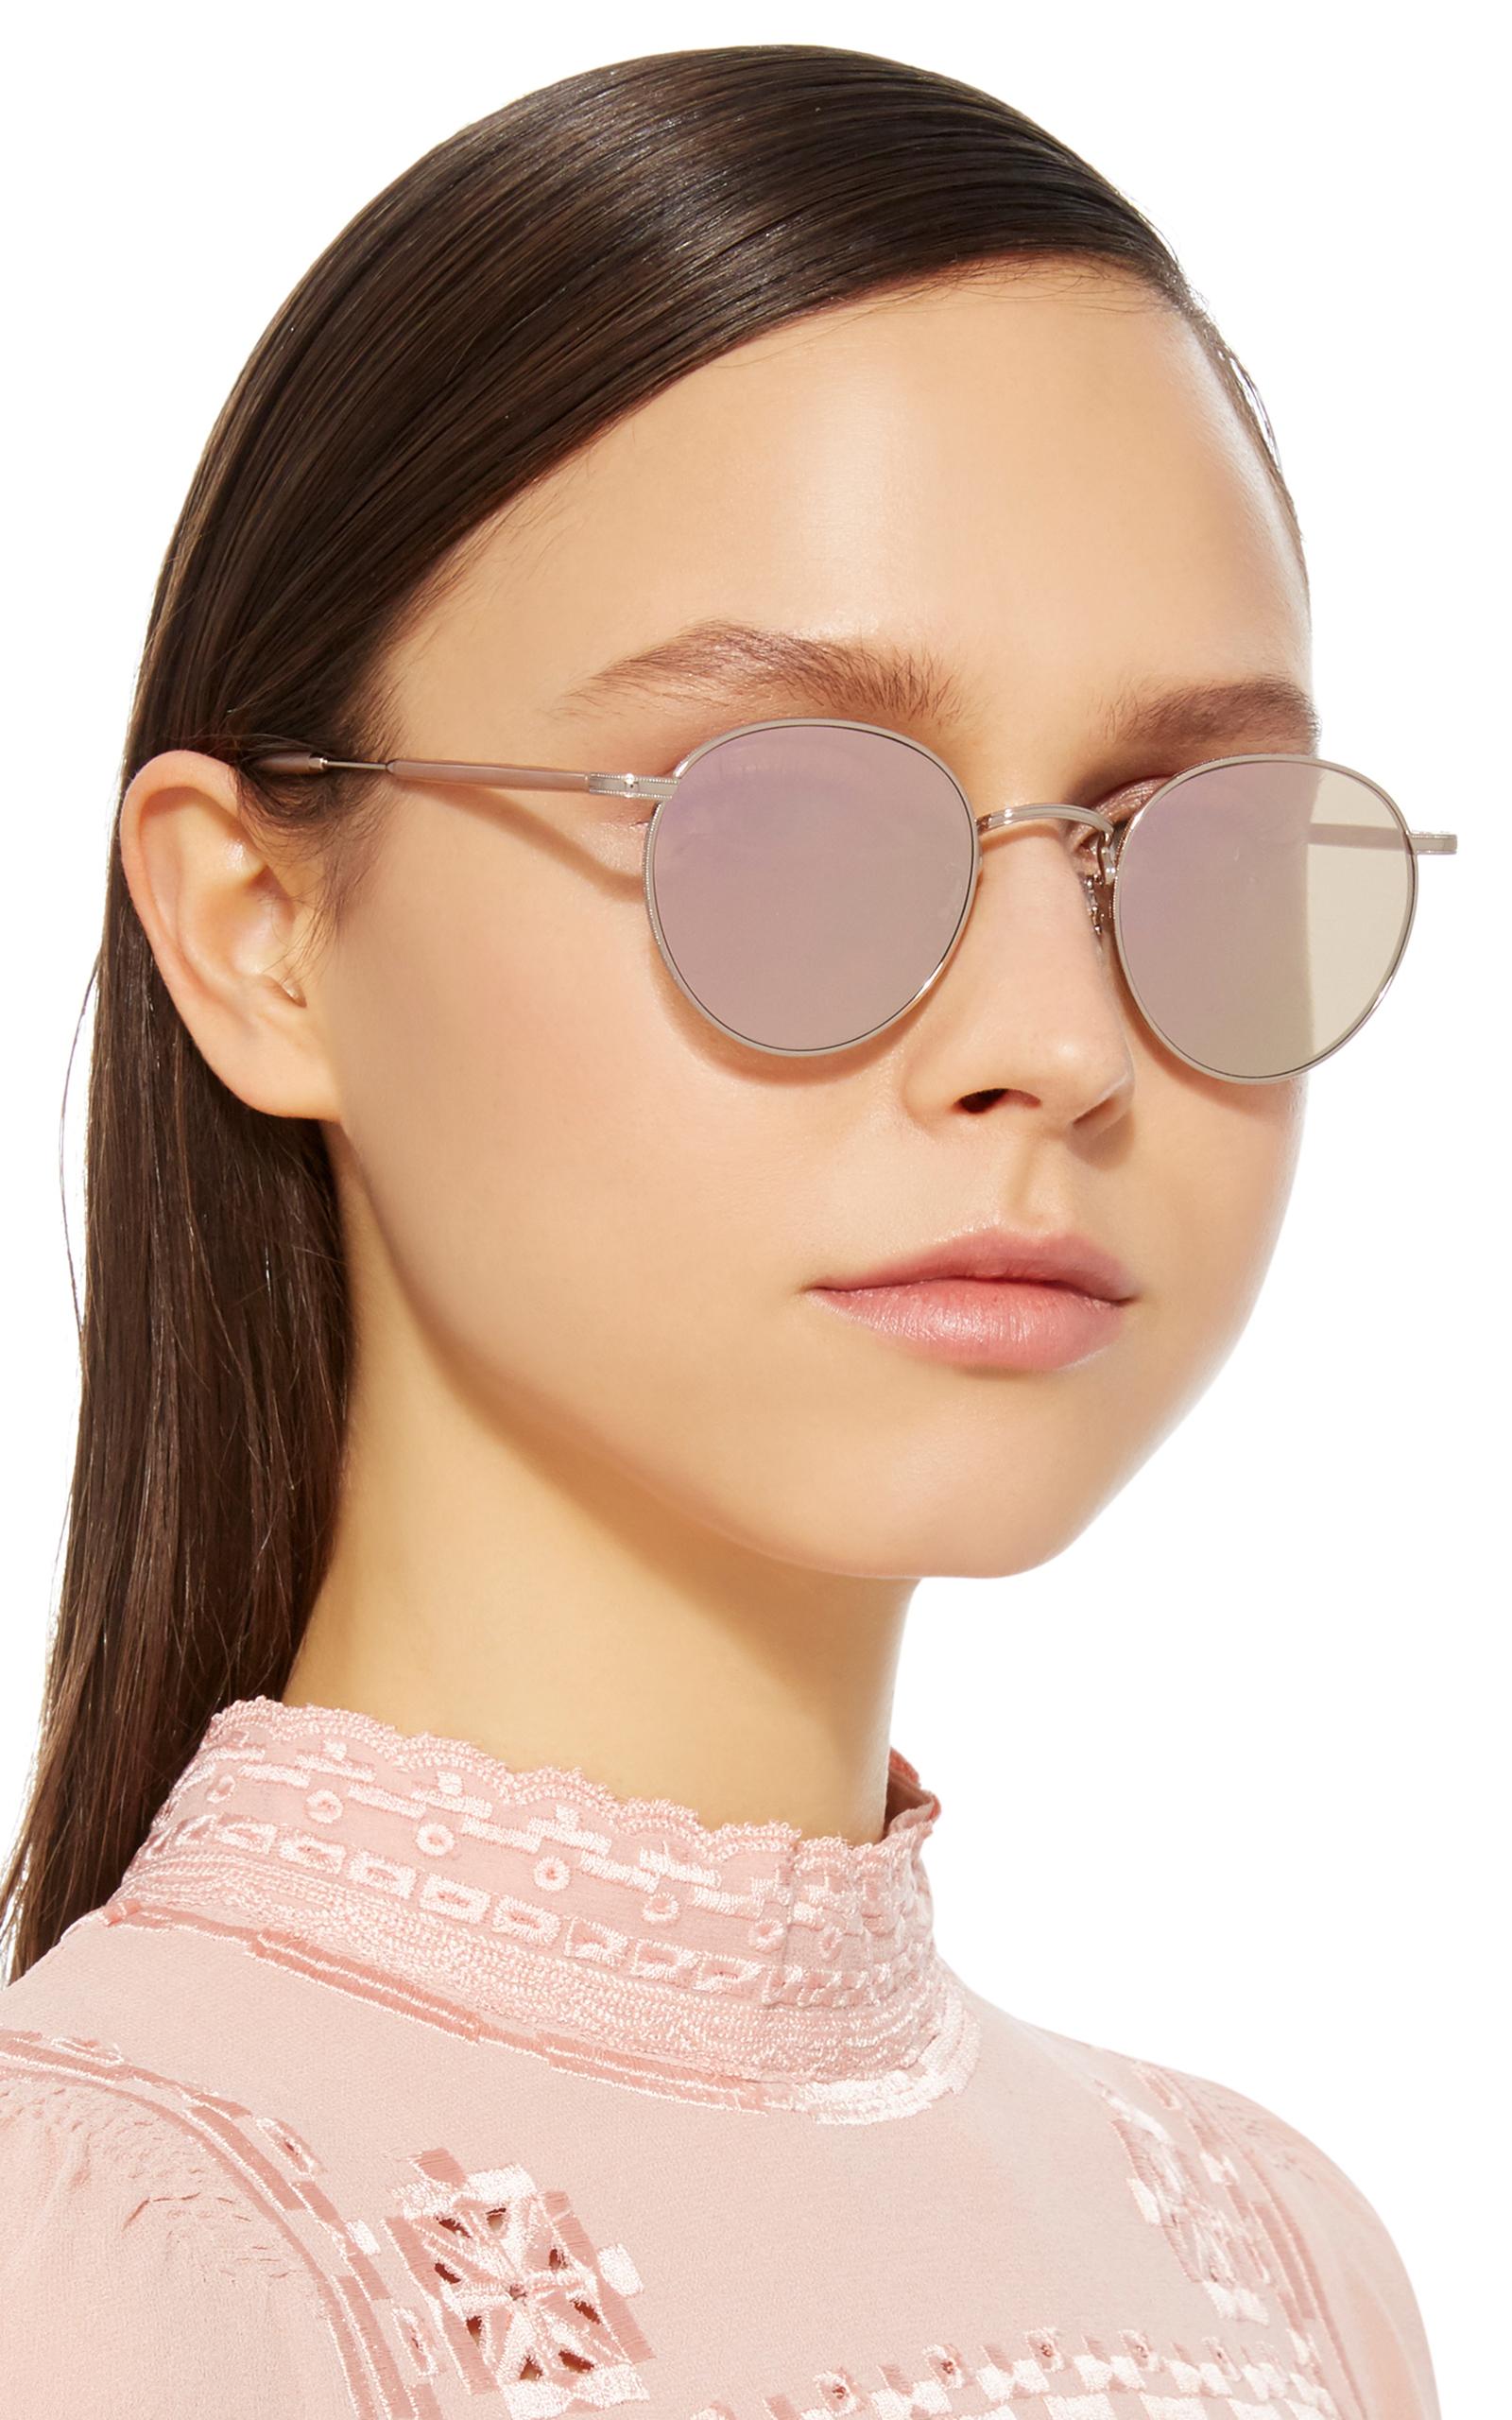 6103d5e6f0 Garrett LeightWilson M Round-Frame Sunglasses. CLOSE. Loading